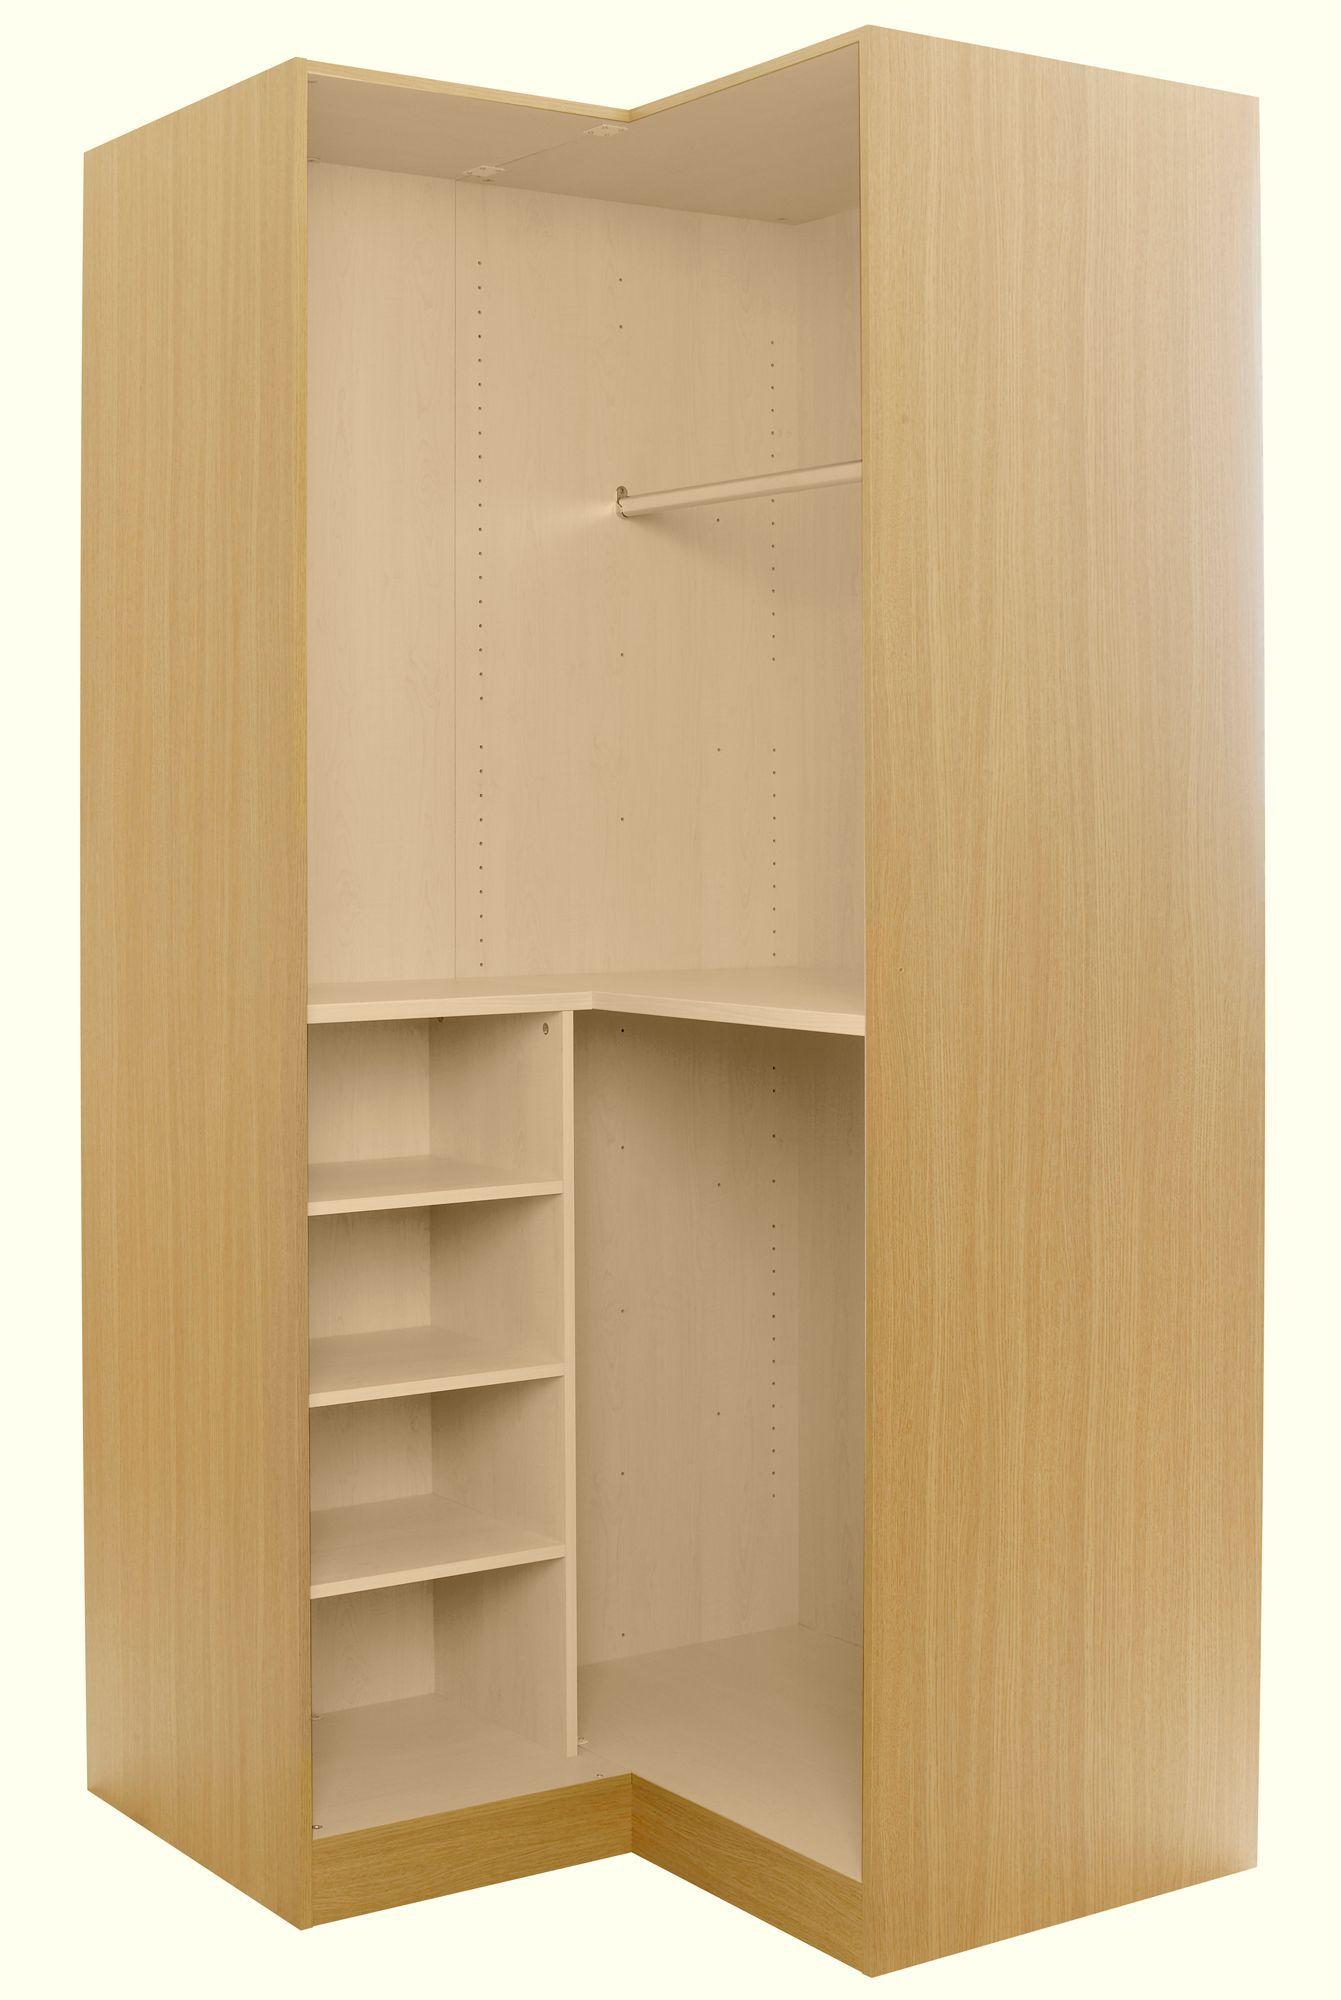 Oak Effect Corner Wardrobe Carcass H 2112mm W 1060mm Departments Diy At B Q